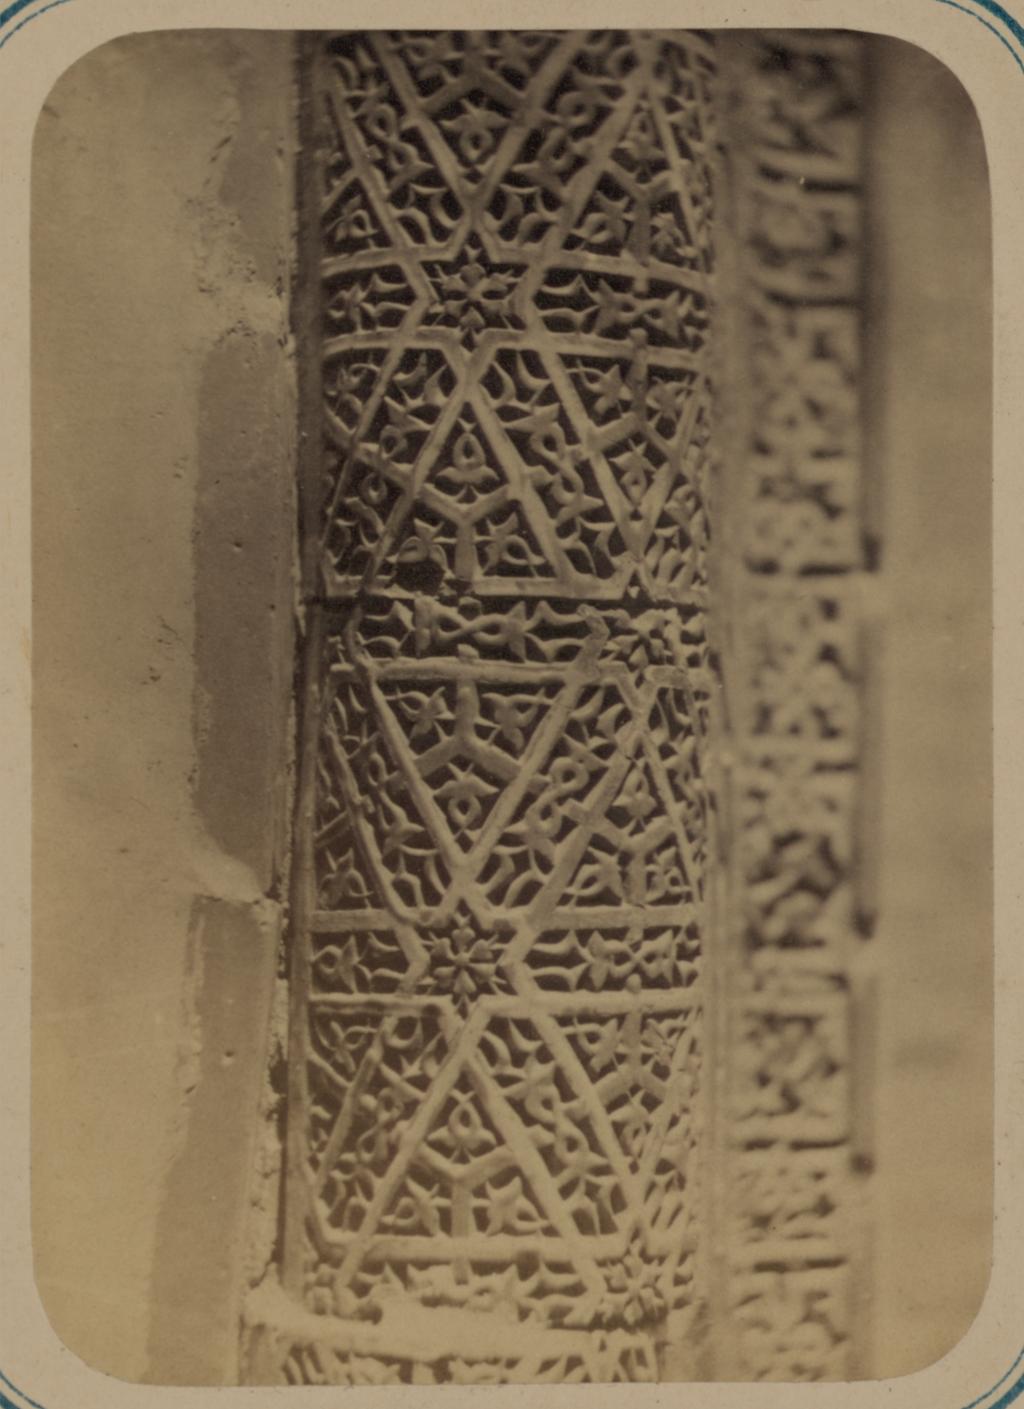 Мавзолей Ша-Арап. Часть колонны